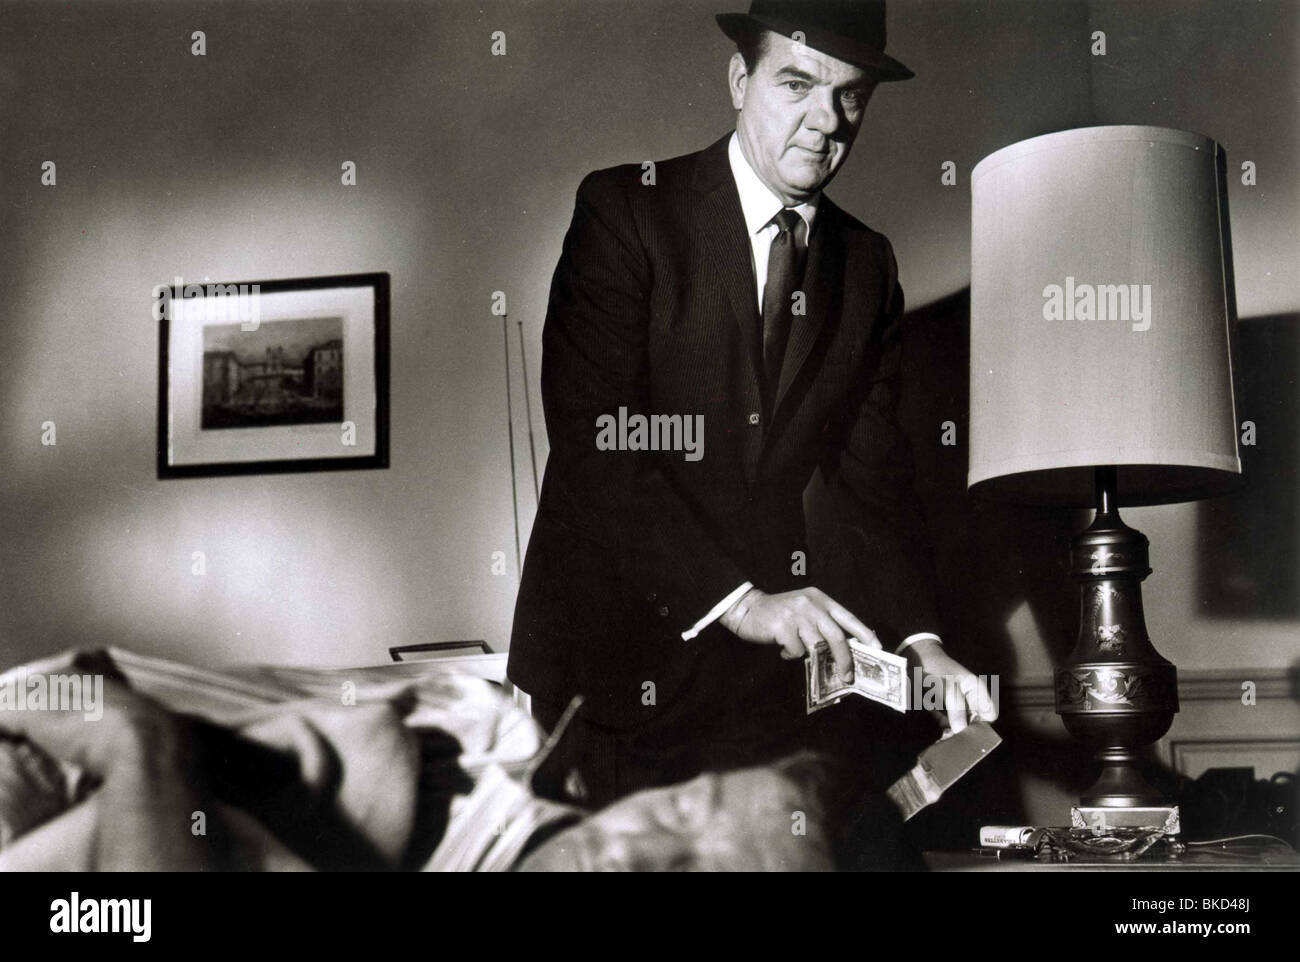 HOTEL -1967 KARL MALDEN - Stock Image